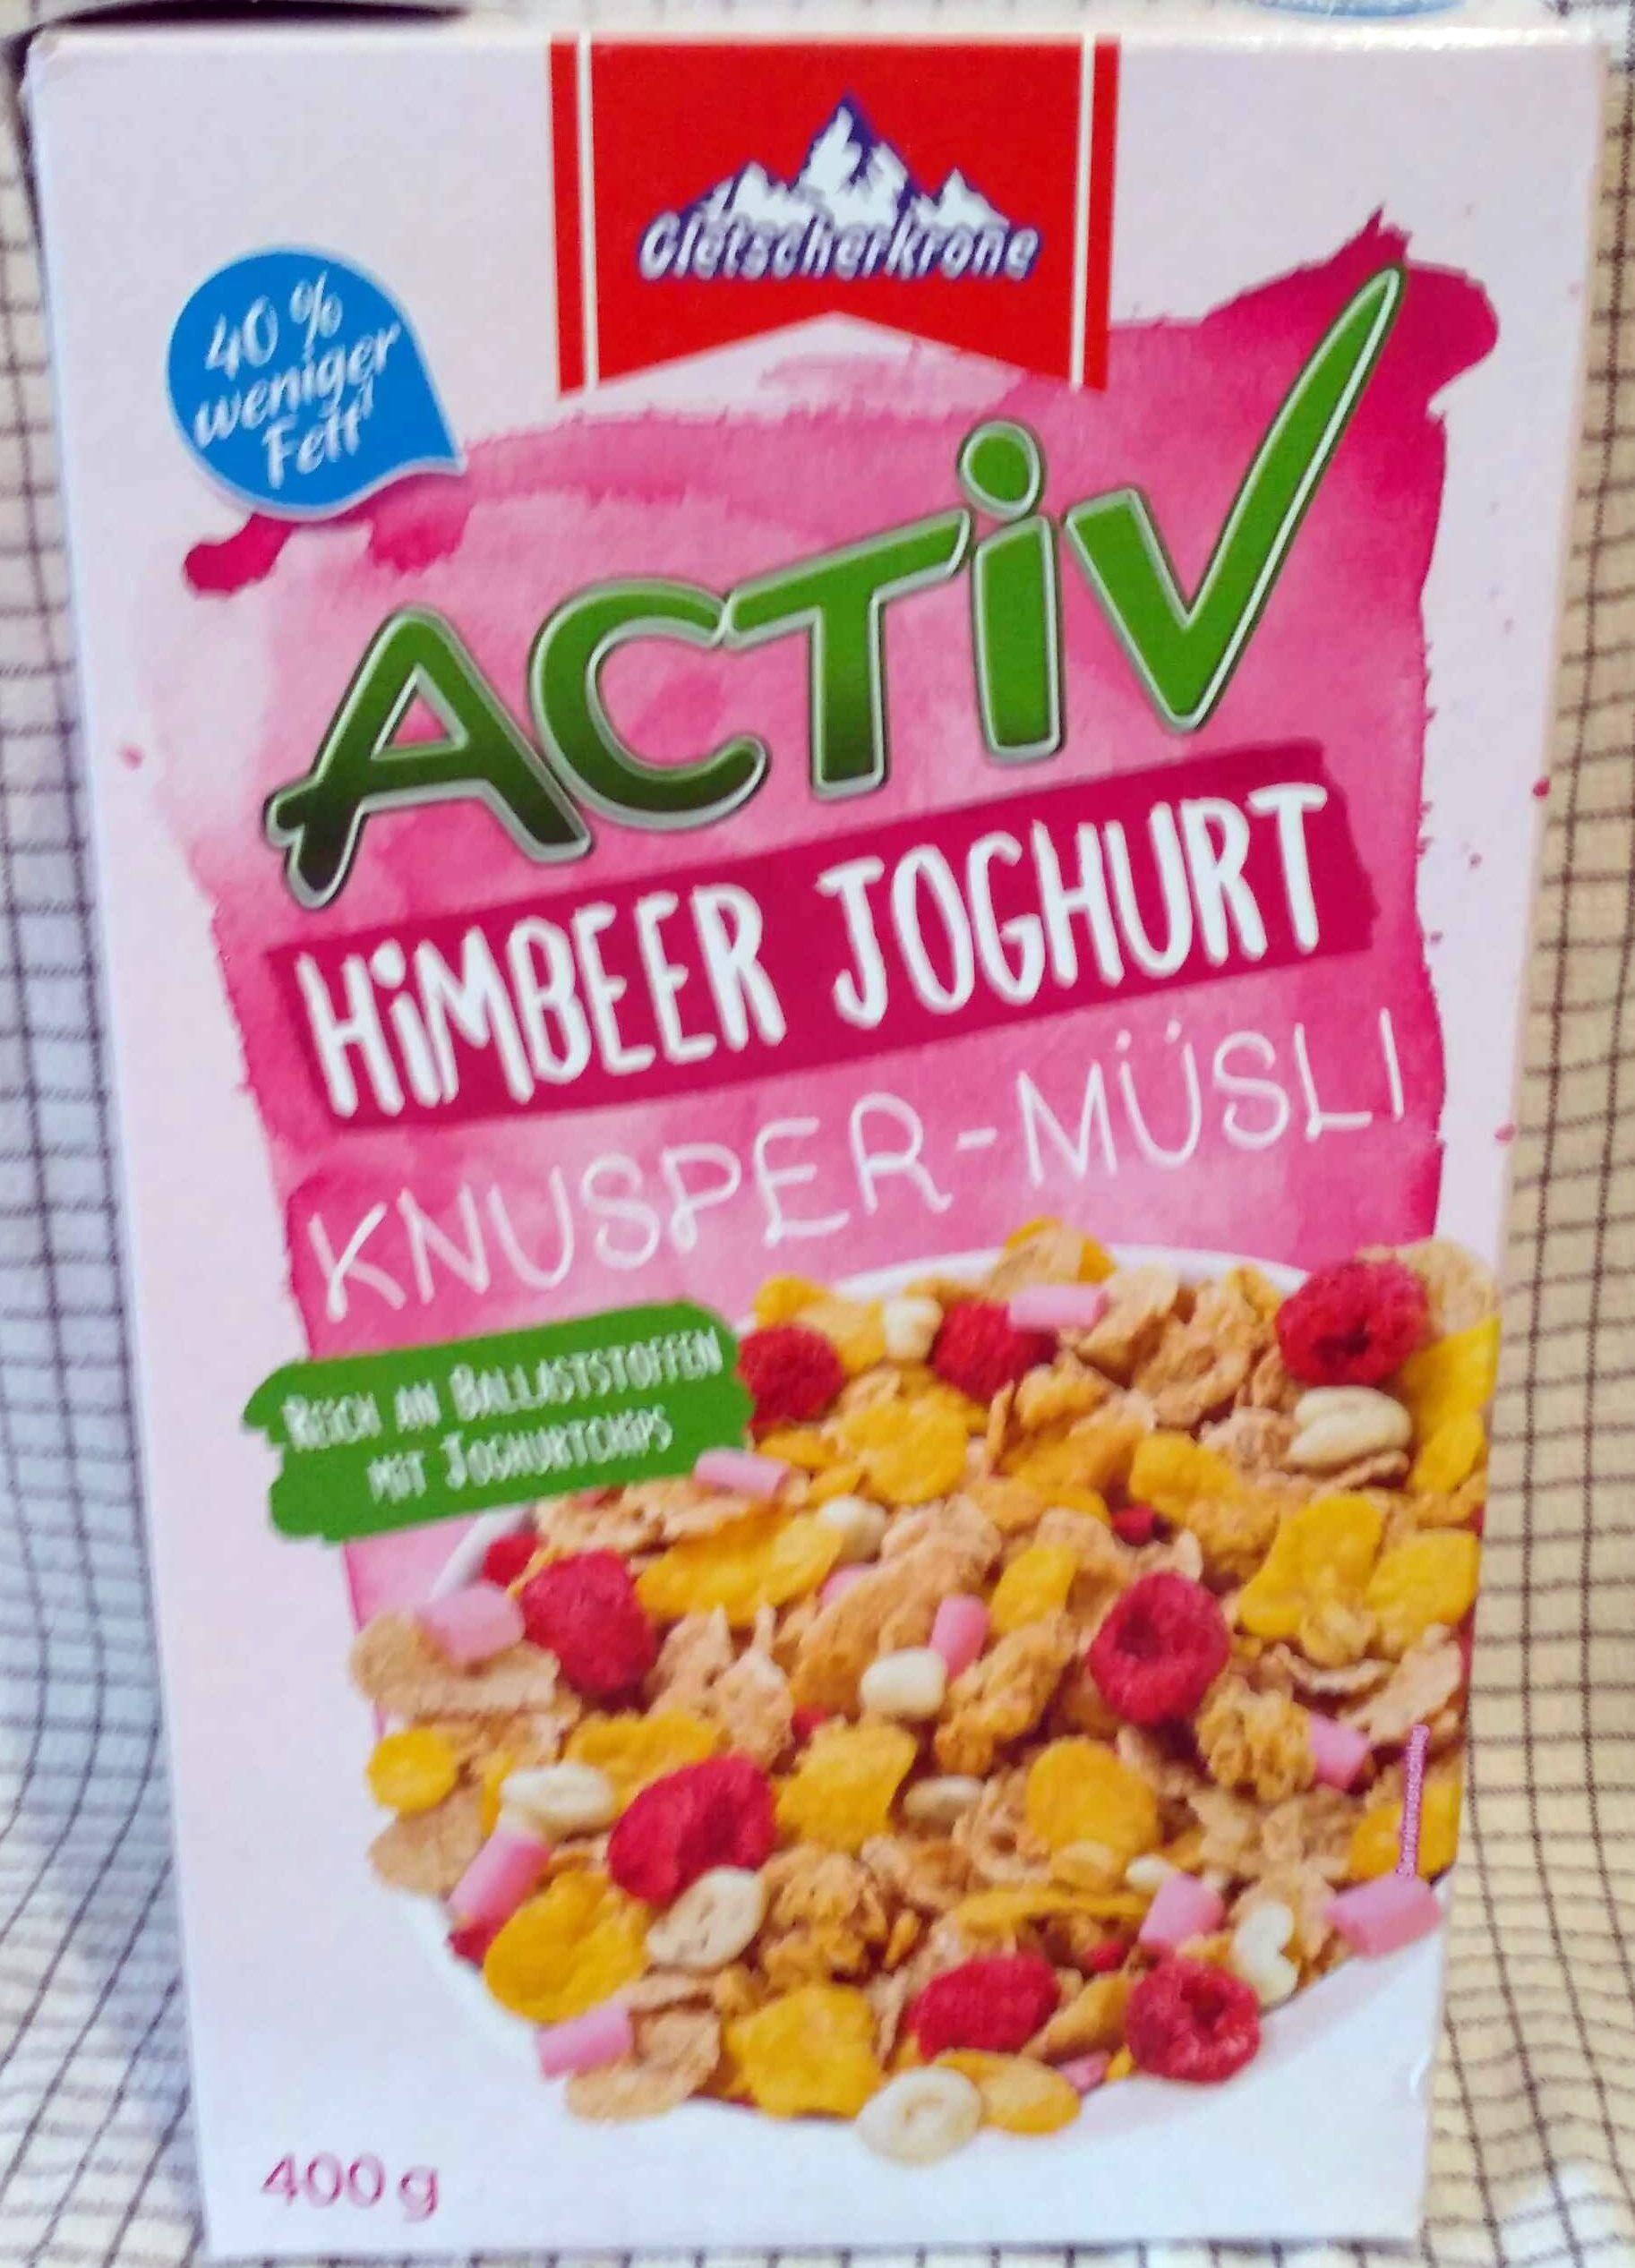 Activ Knusper-Müsli (Himbeer Joghurt, Schoko, Pur) - Product